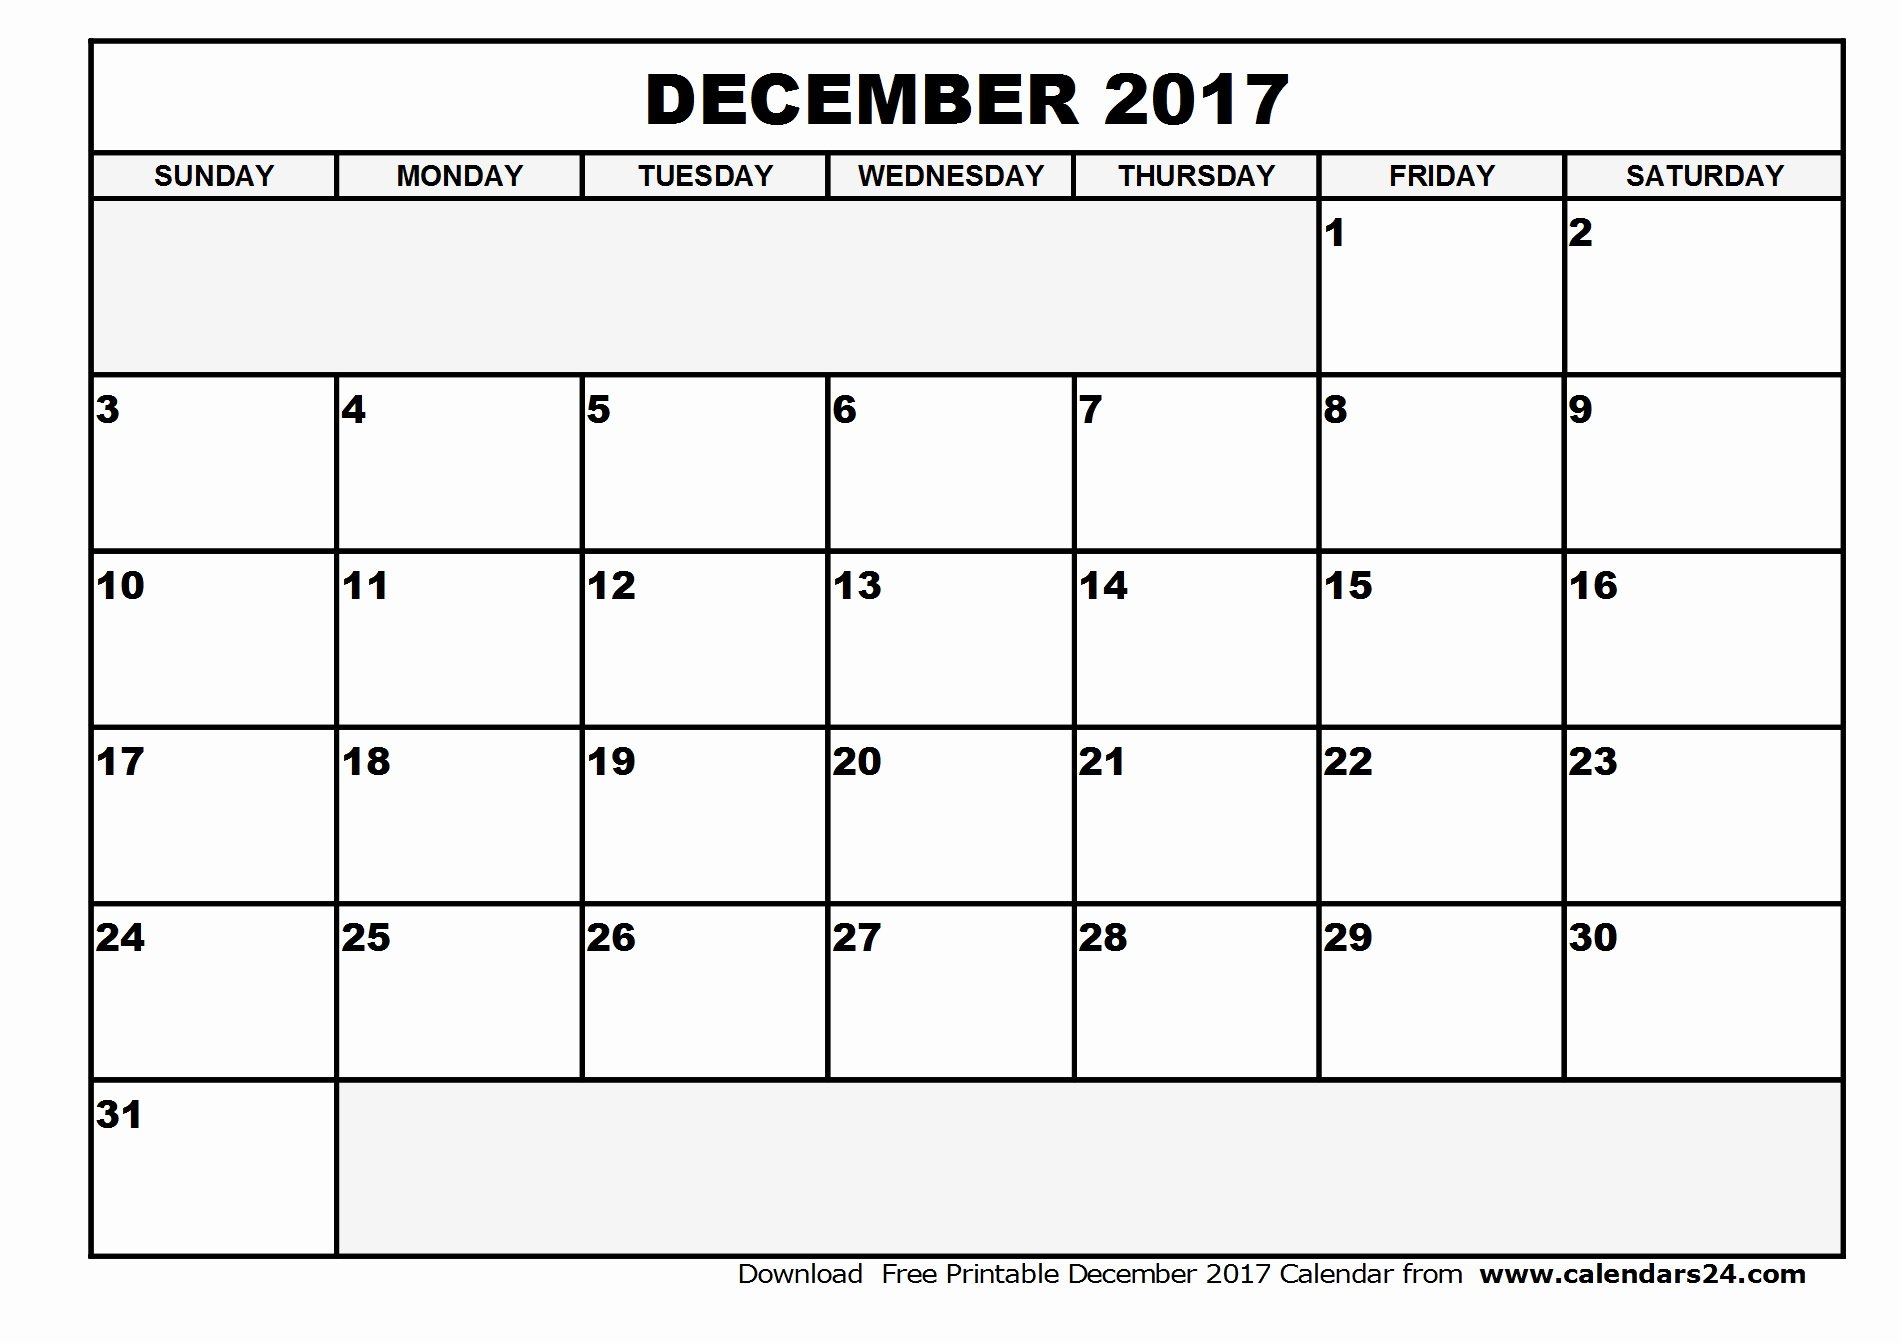 December 2017 Calendar Excel